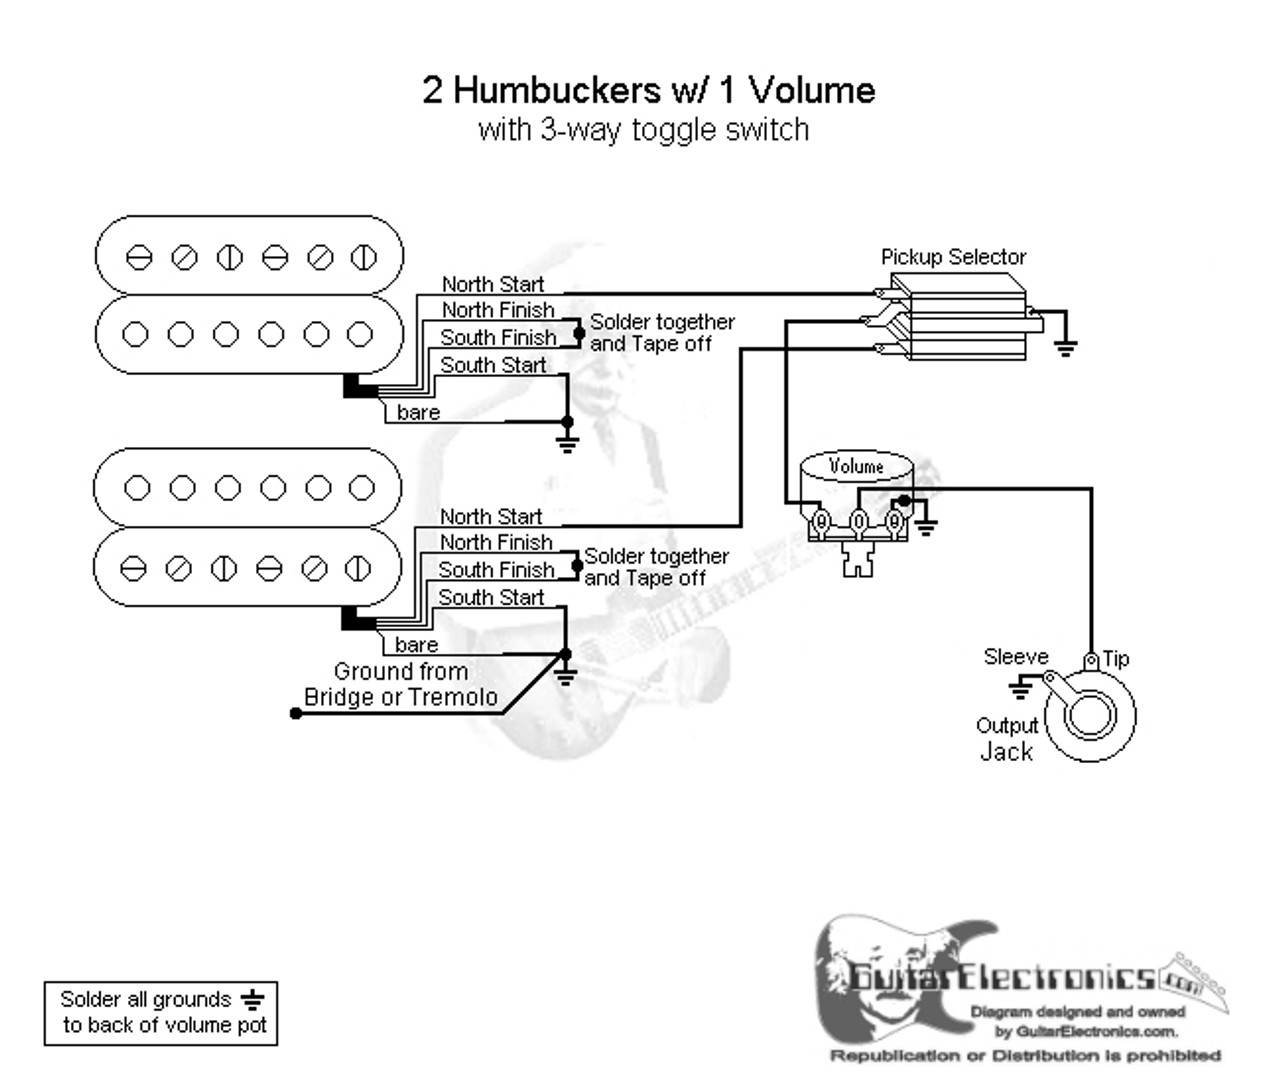 humbucker single 1 volume 3 way switch wiring diagram humbuckers2 humbuckers 3 way toggle switch 1 [ 1280 x 1083 Pixel ]